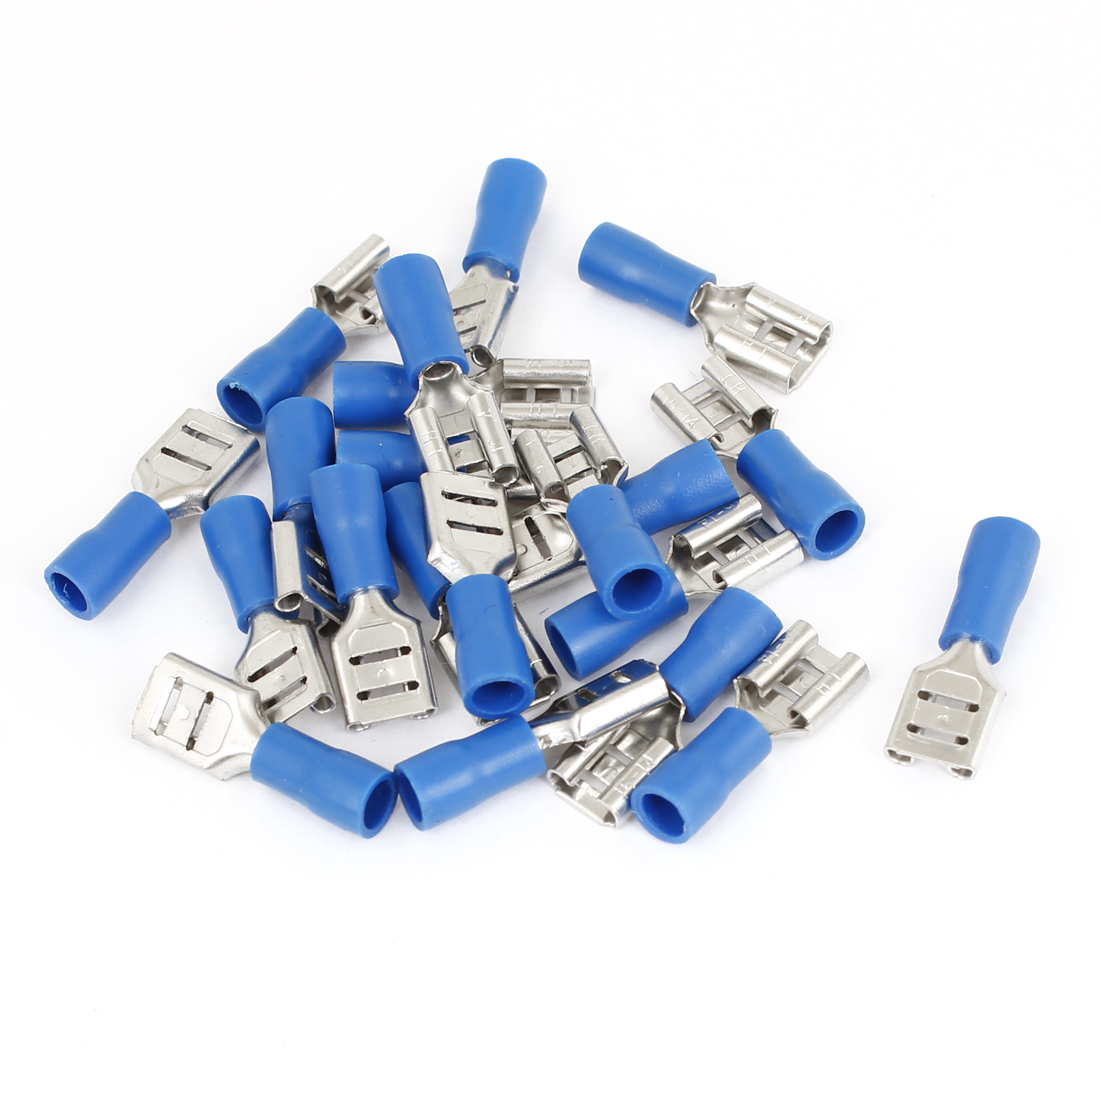 20 PCS FDD2-250 Blue Pre Insulated Female Type Spade Crimp Connectors